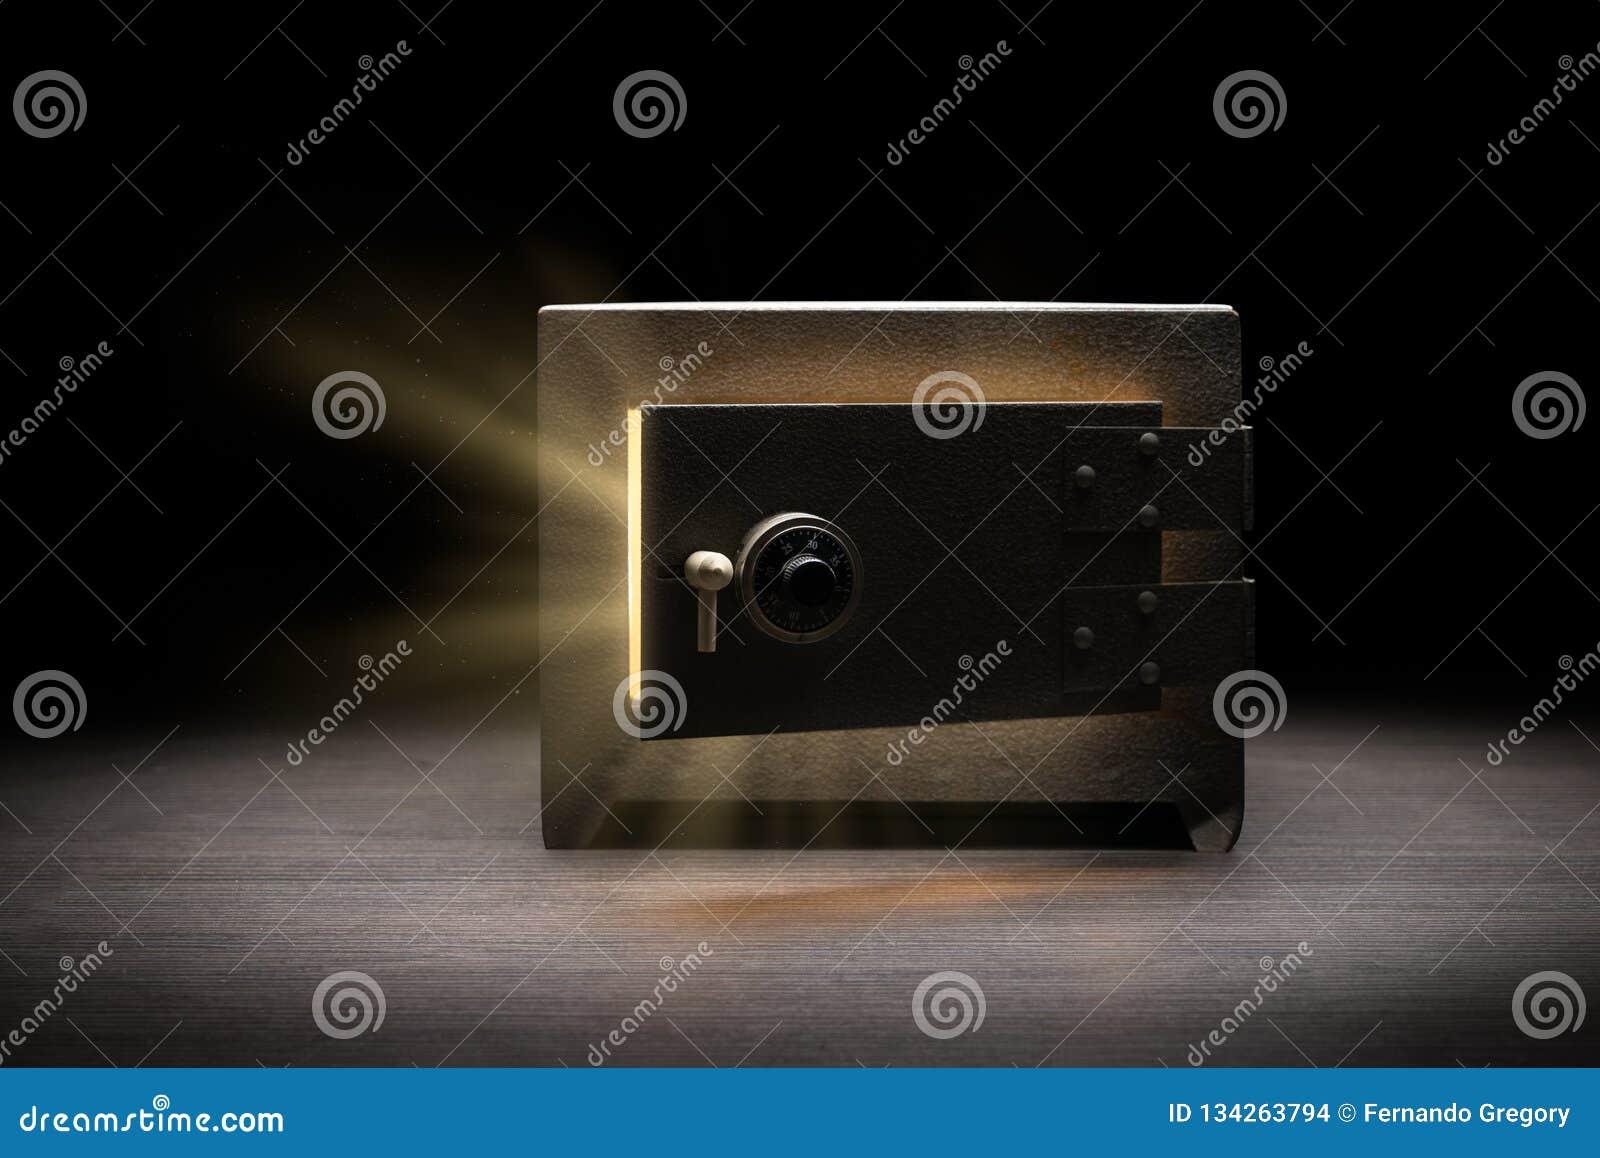 Steel bank safe on a dark background